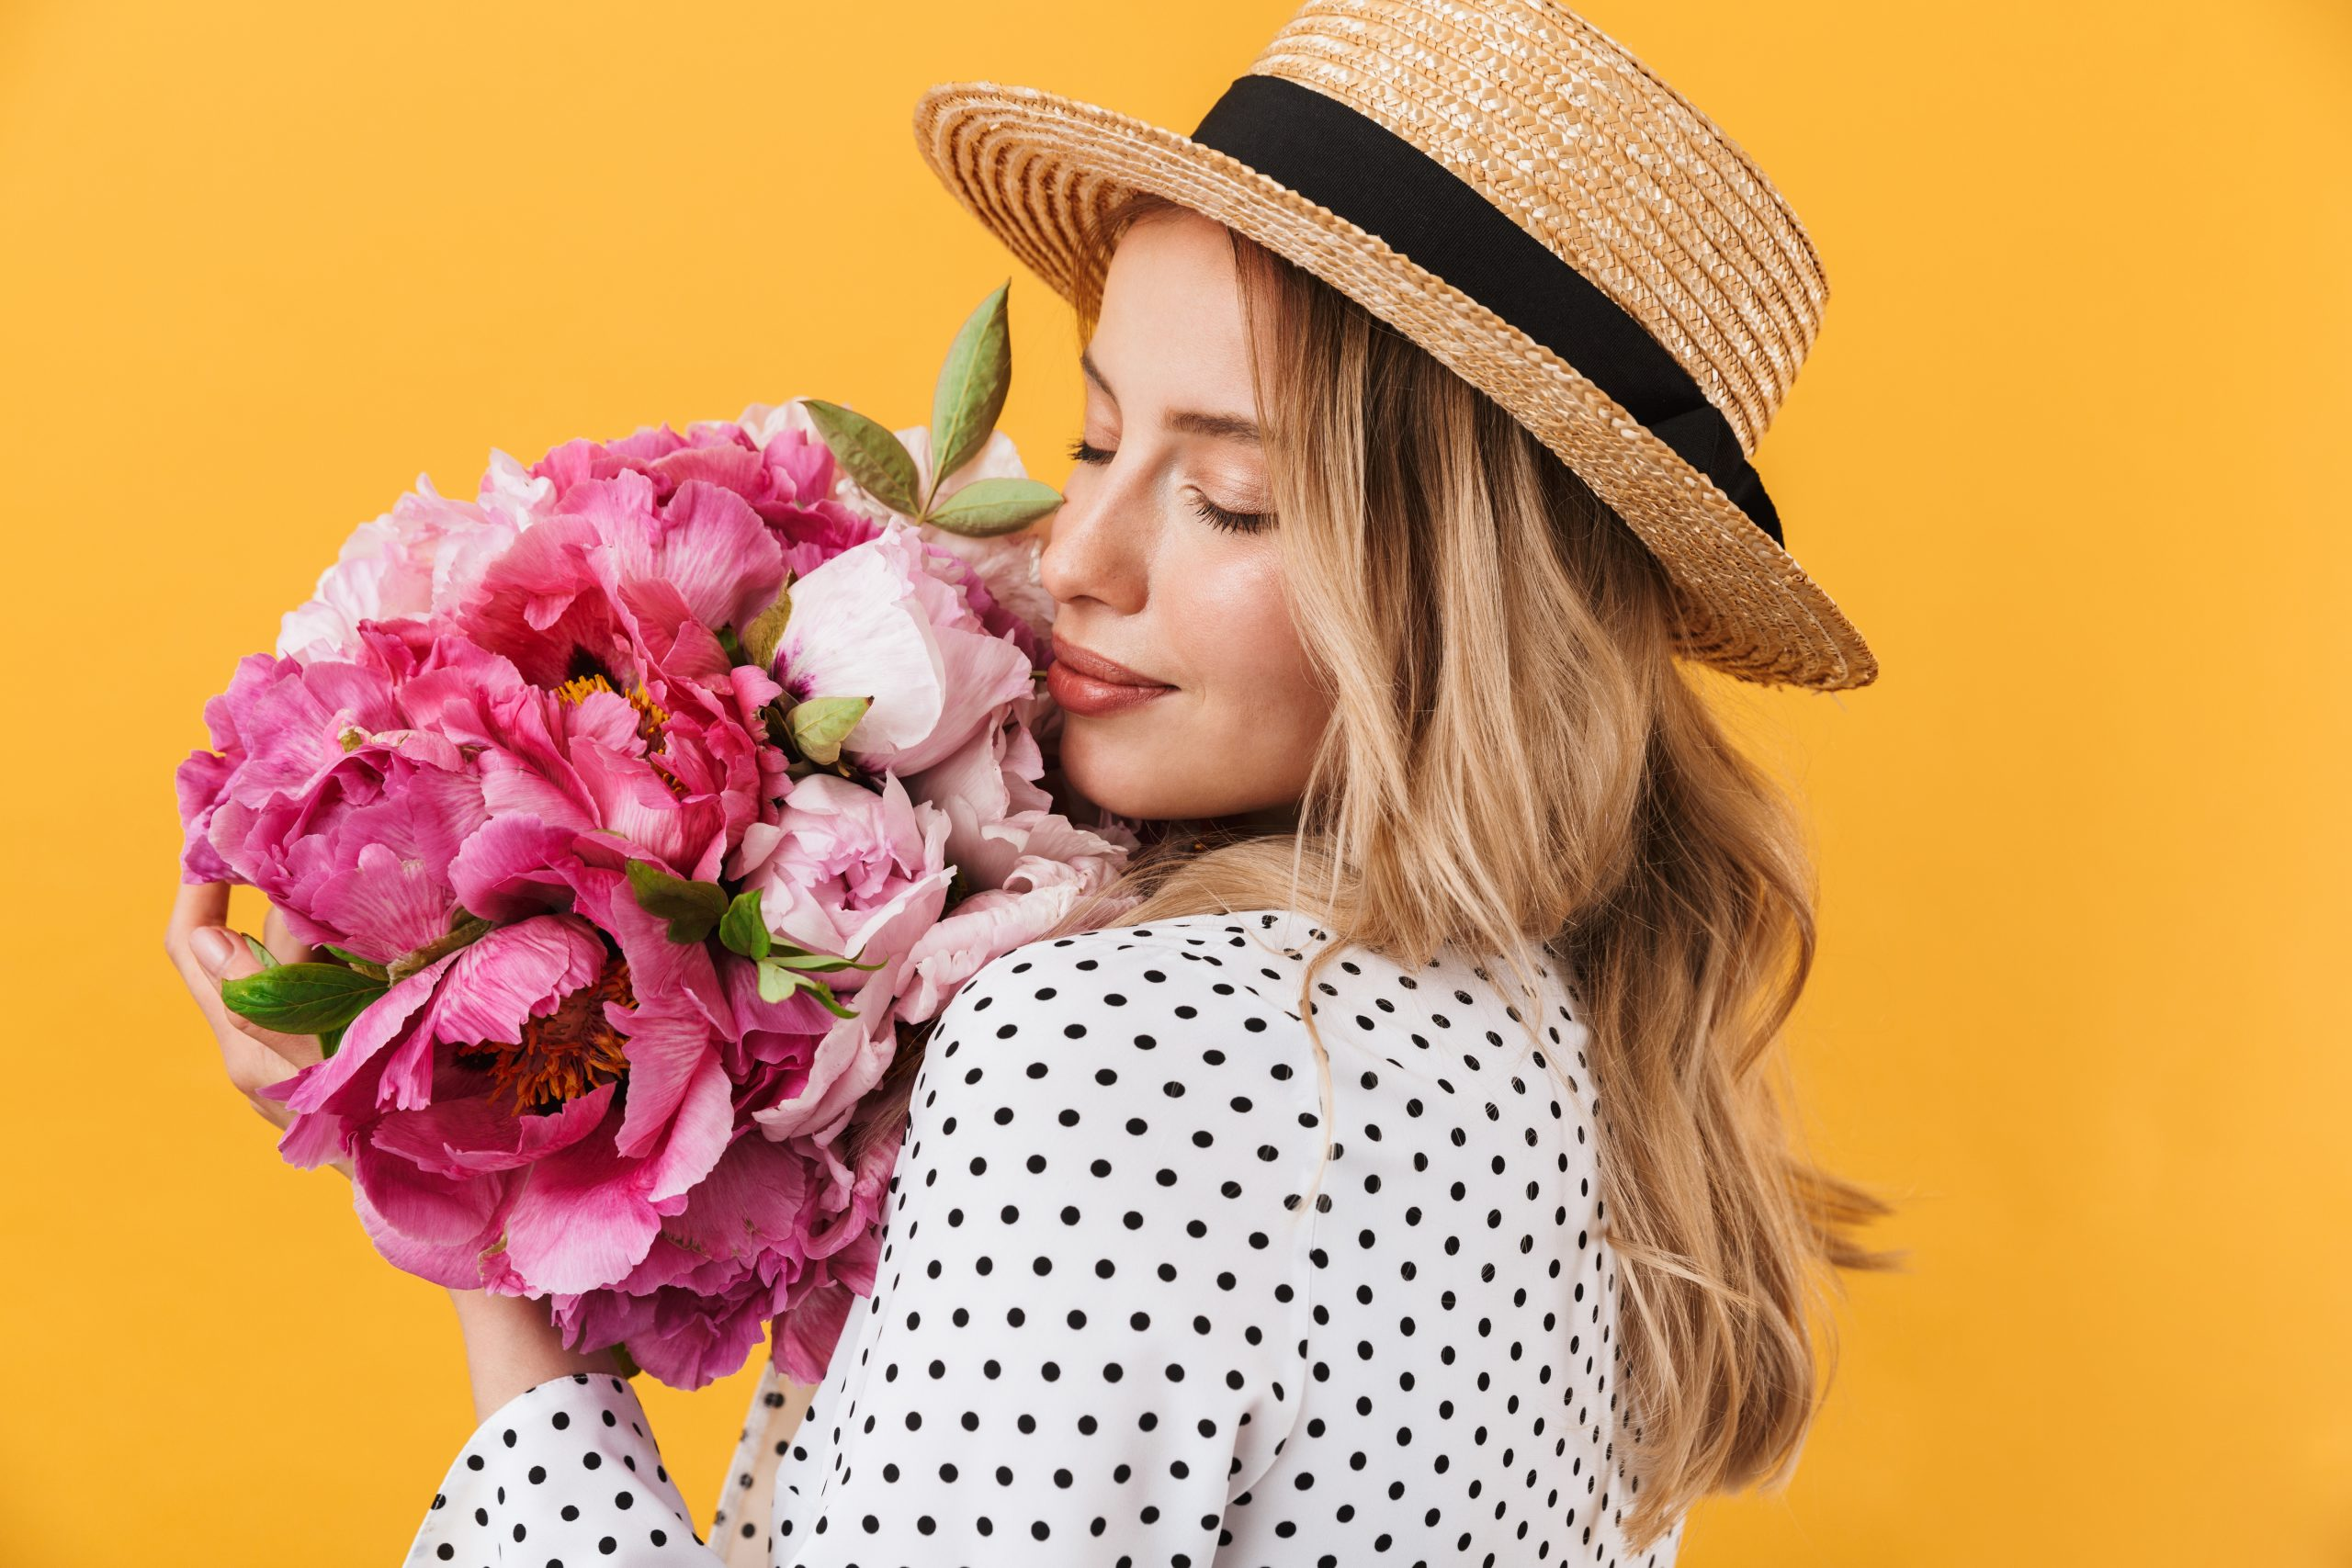 Uniting Flowers Australia